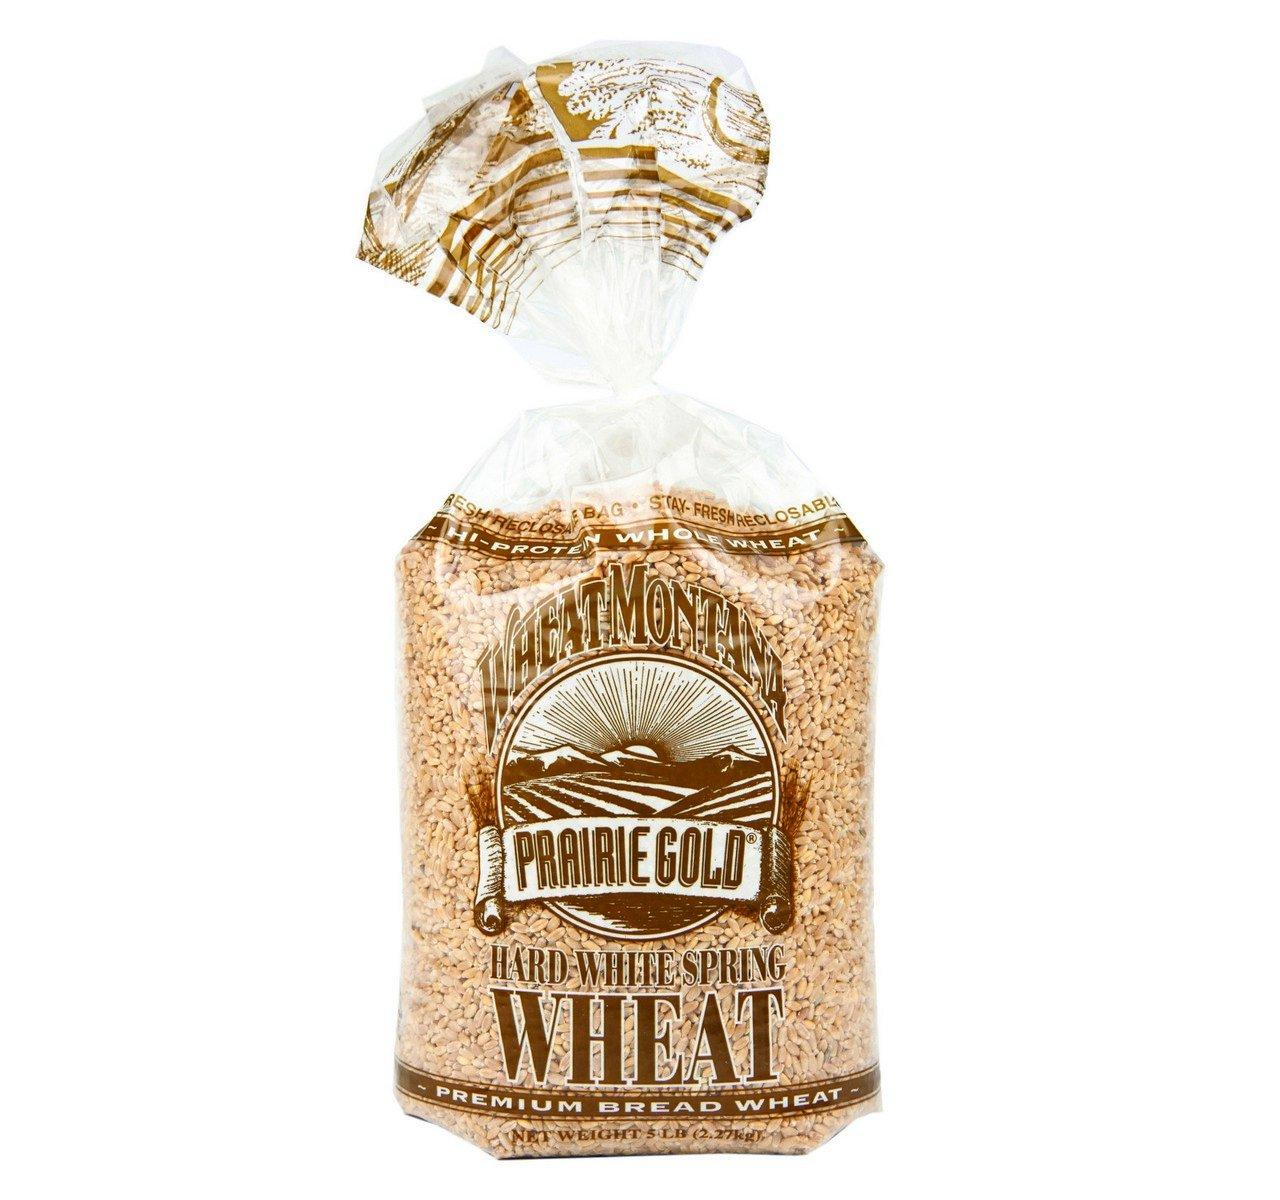 Wheat Montana Prairie Gold Hard White Spring Wheat Berries (Pack of Four - 5 Lb. Bags)